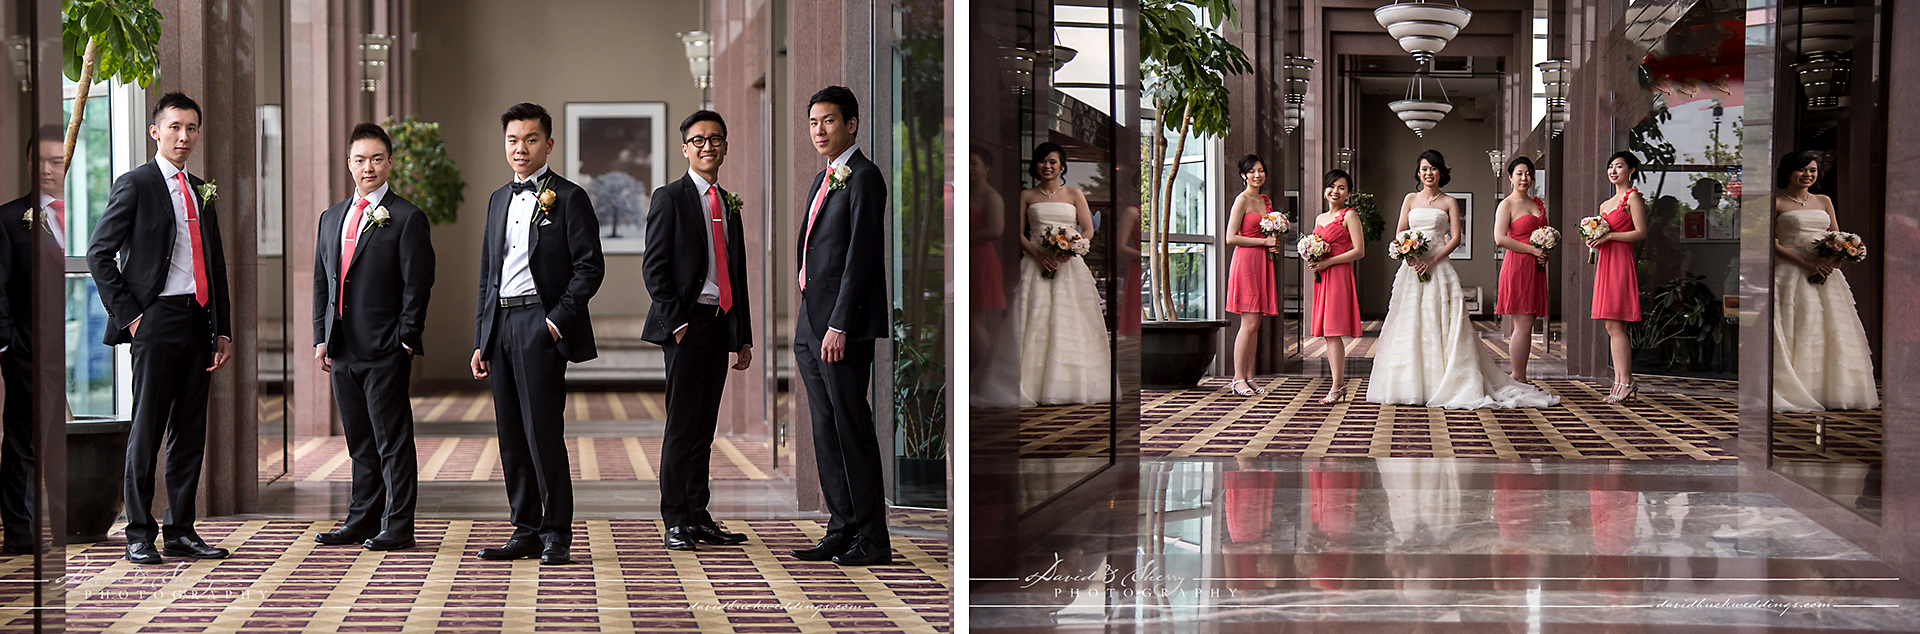 Toronto_Hilton_Markham_Suites_Wedding_11